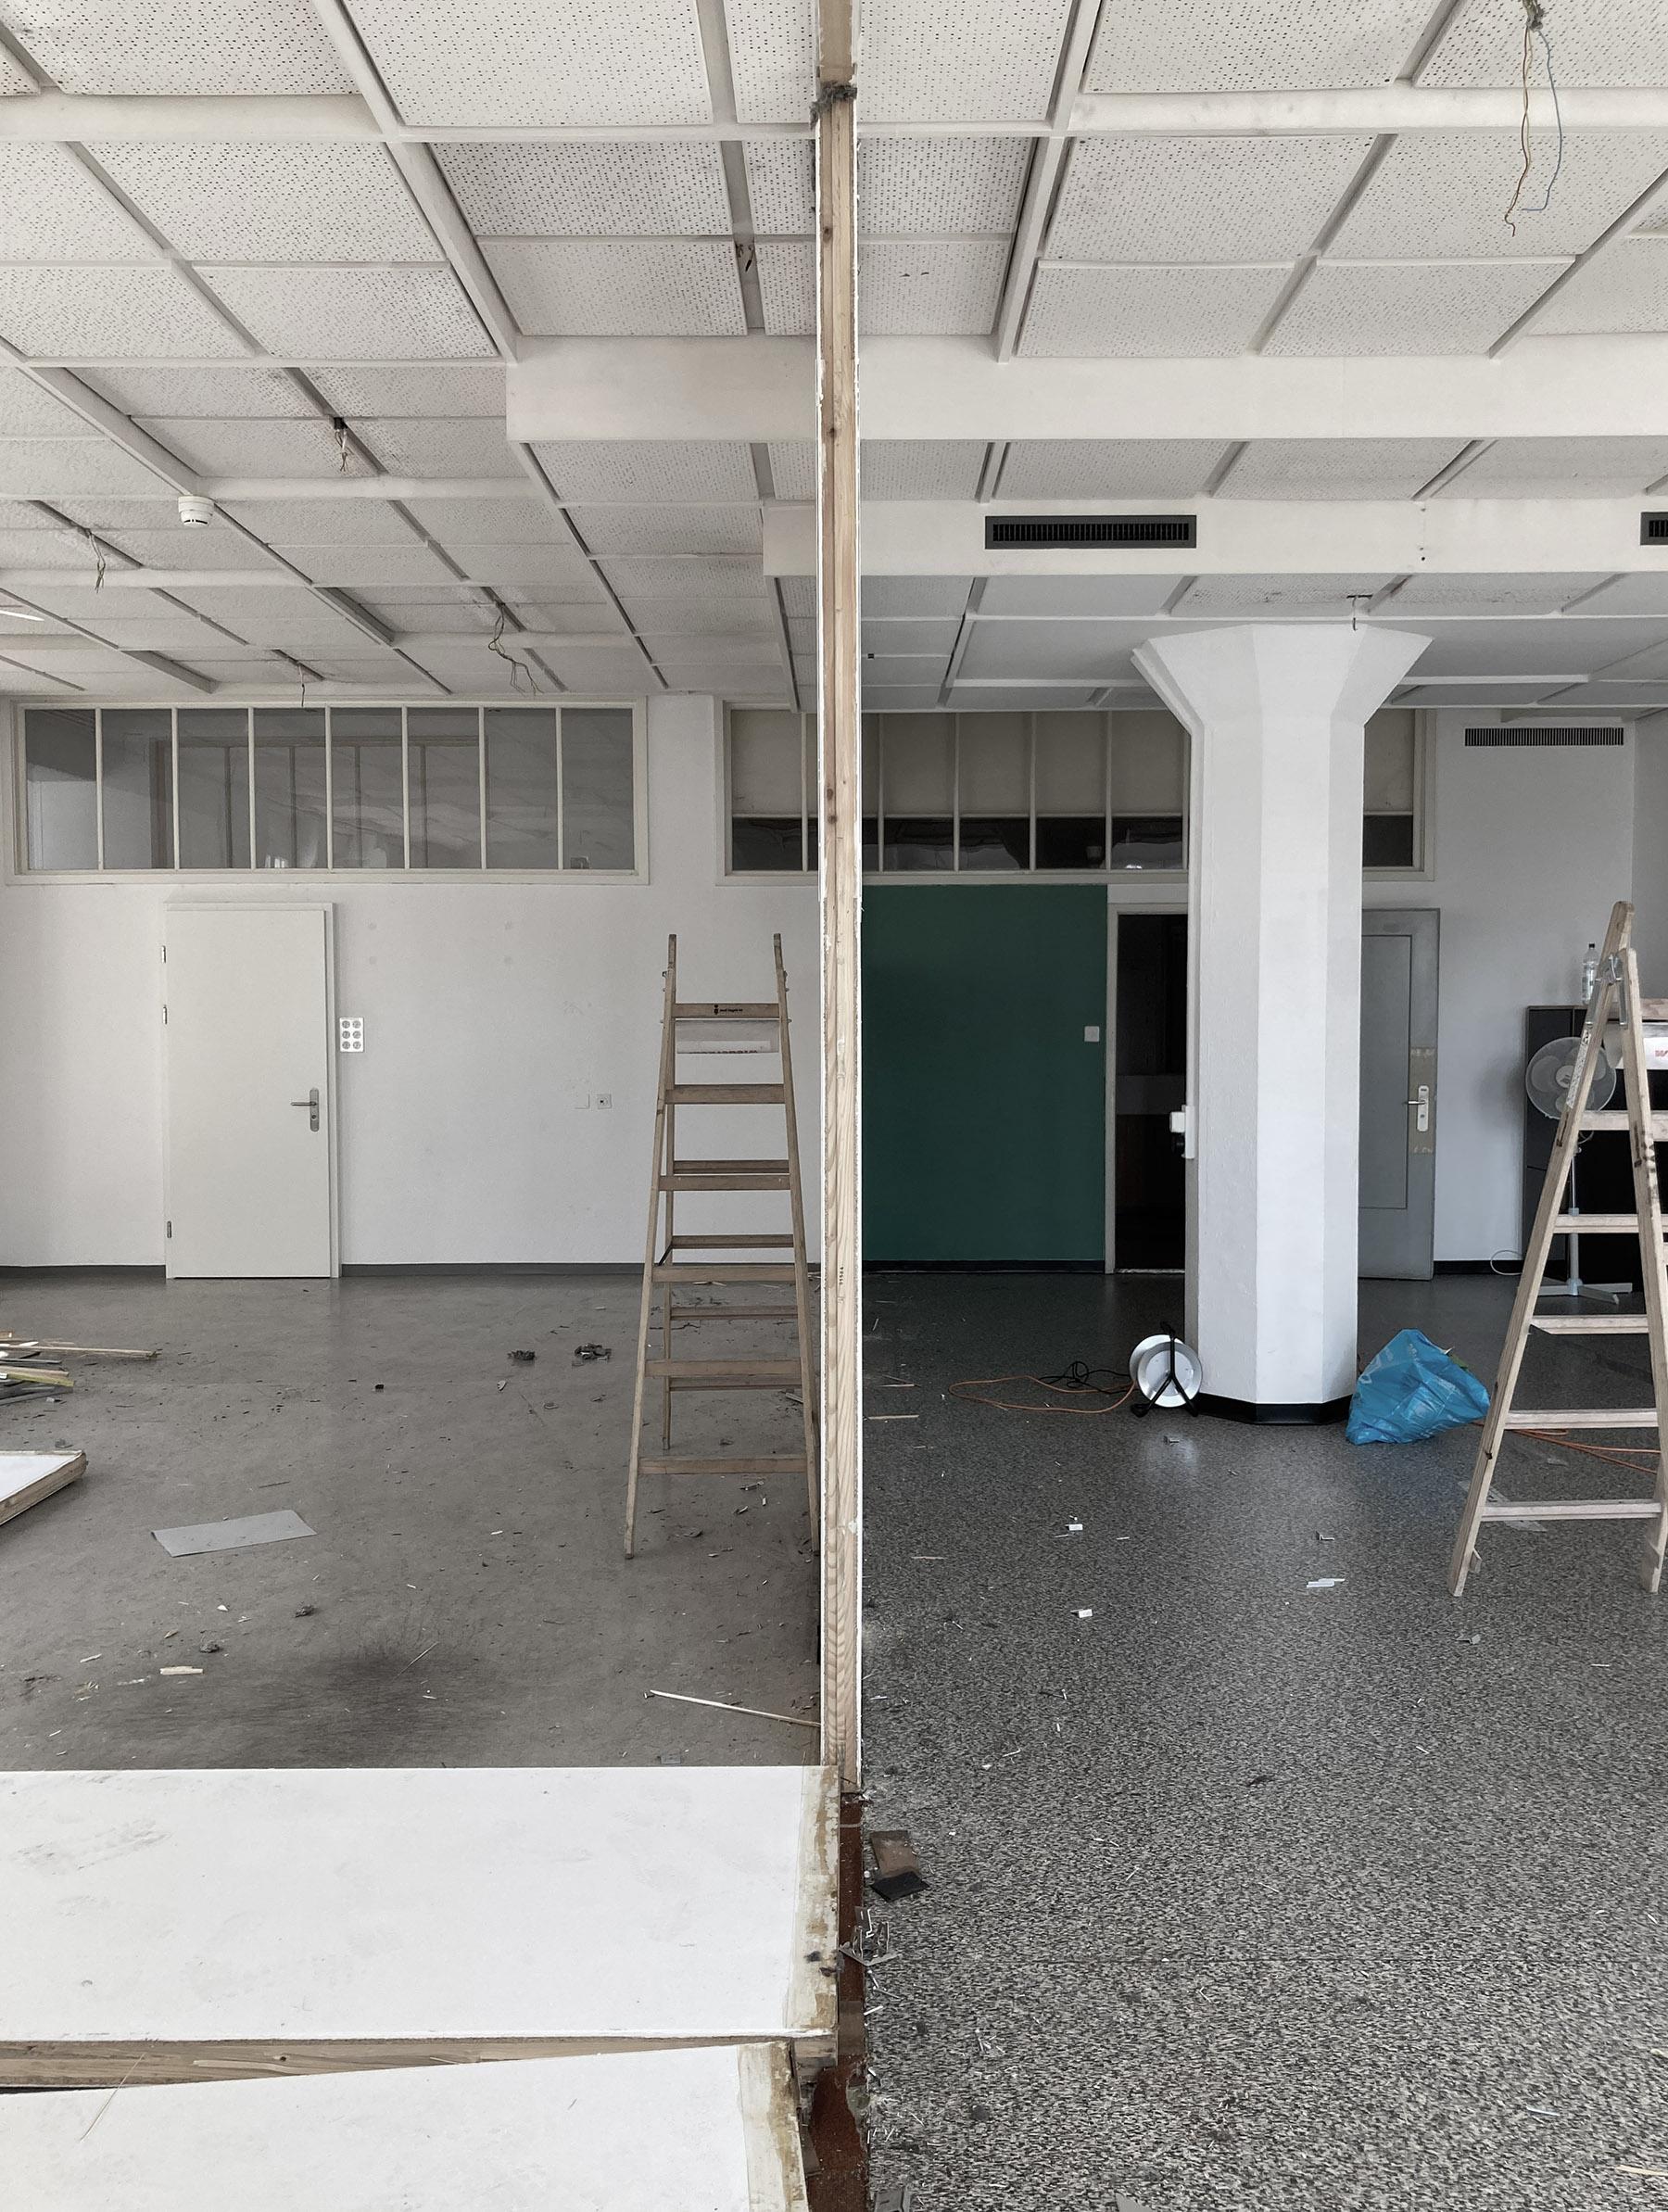 buan architekten – Umbau Büro Viscosistadt– Umbauarbeiten